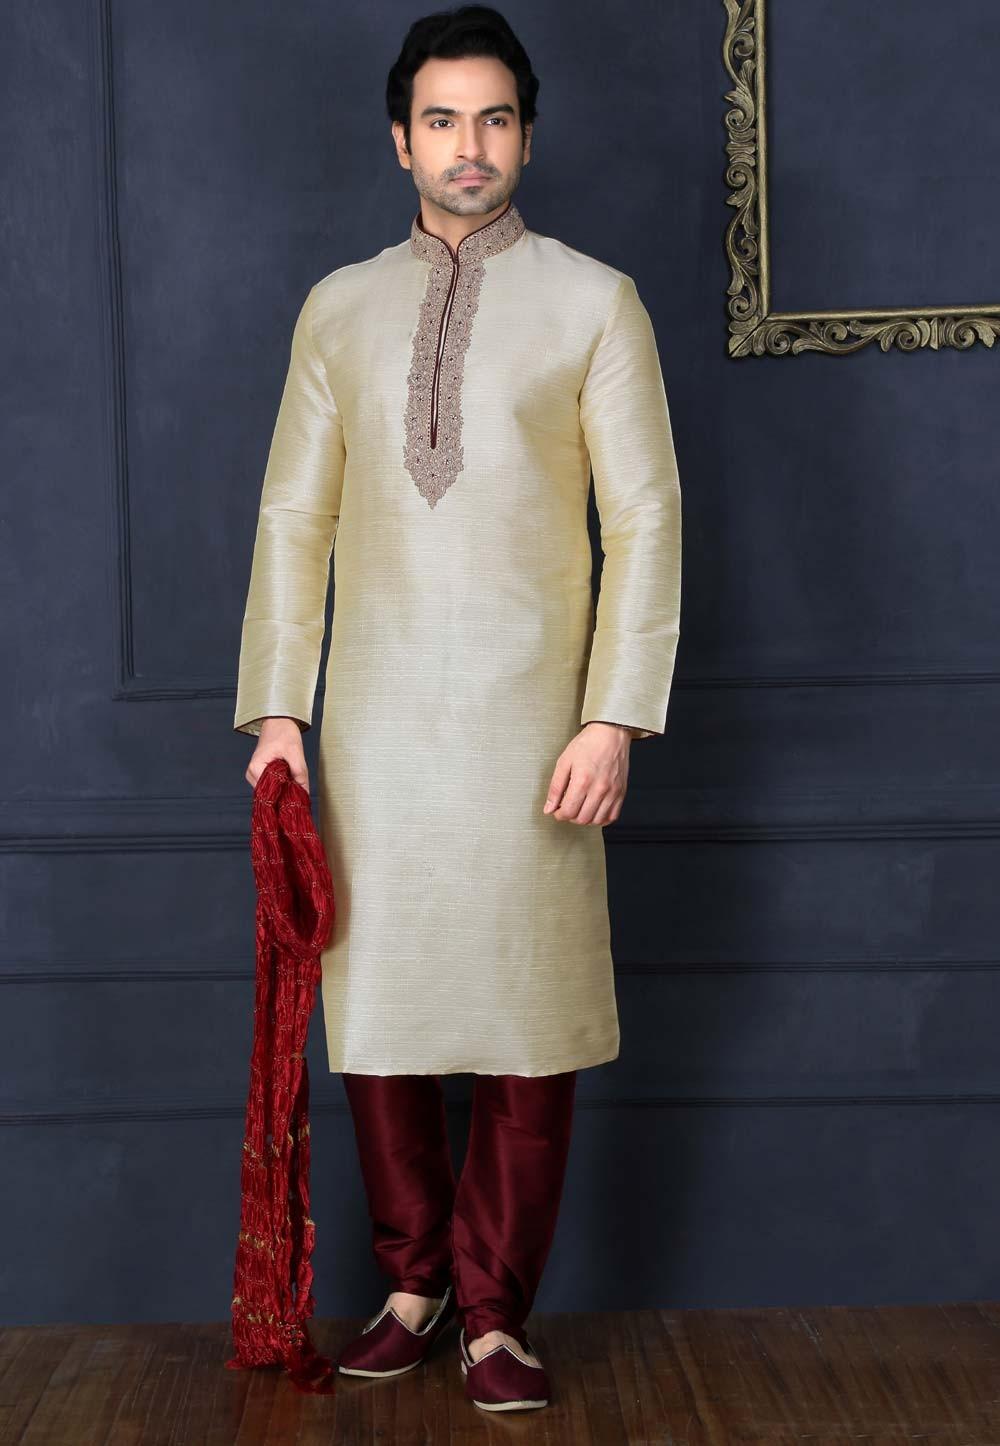 Exquisite Art Silk Beige Color Men's Readymade Kurta Pajama.